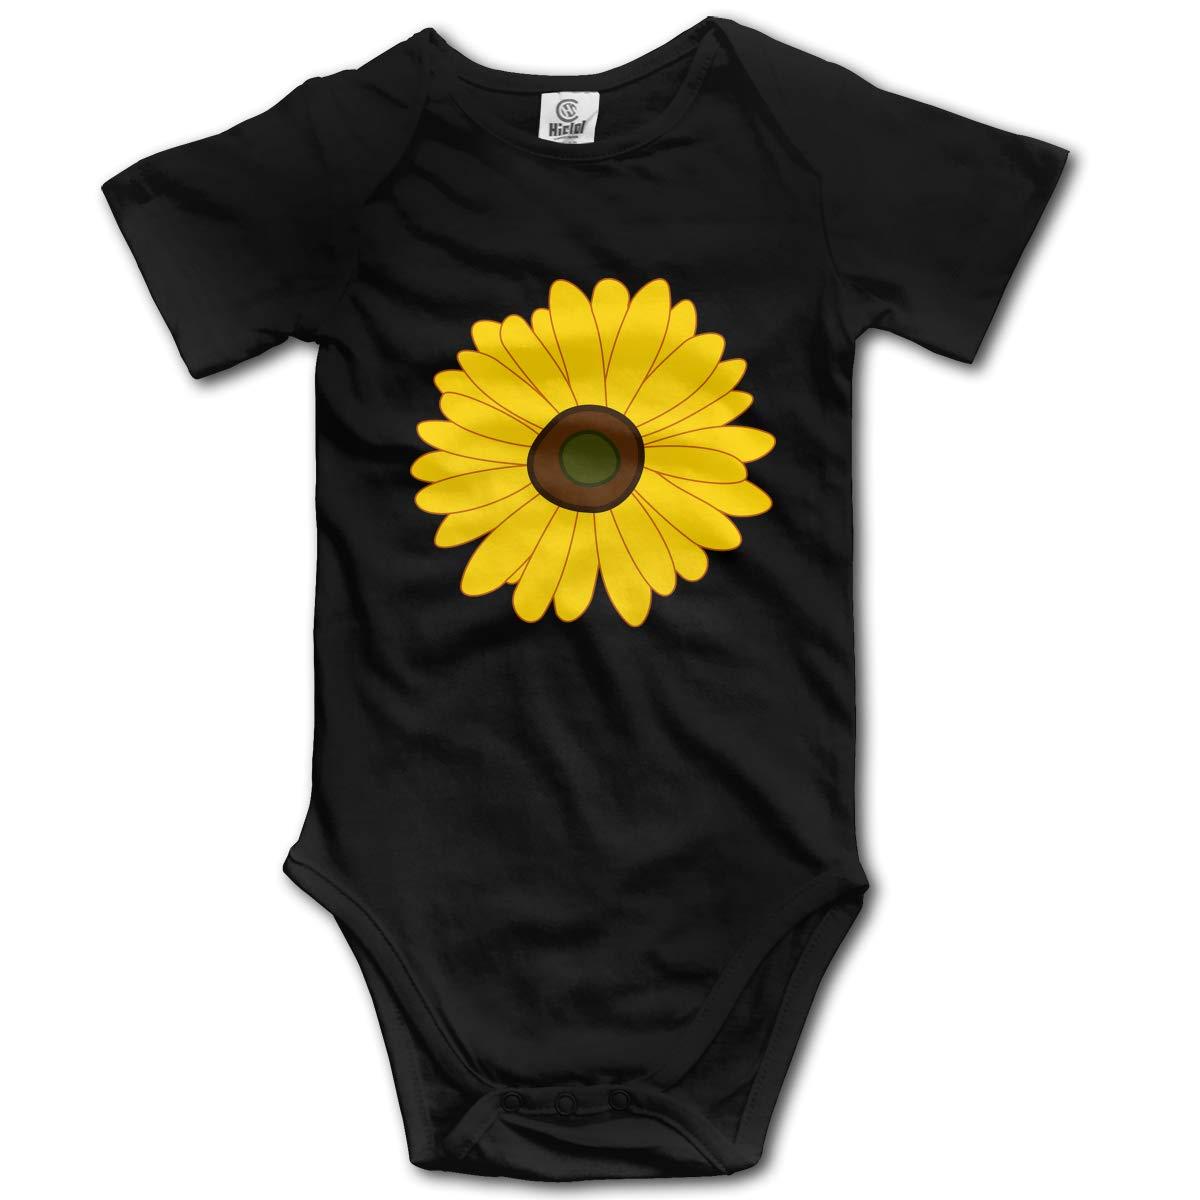 CDHL99 Sunflower Unisex Solid Baby Short Sleeve Bodysuit Rompers 0-24M